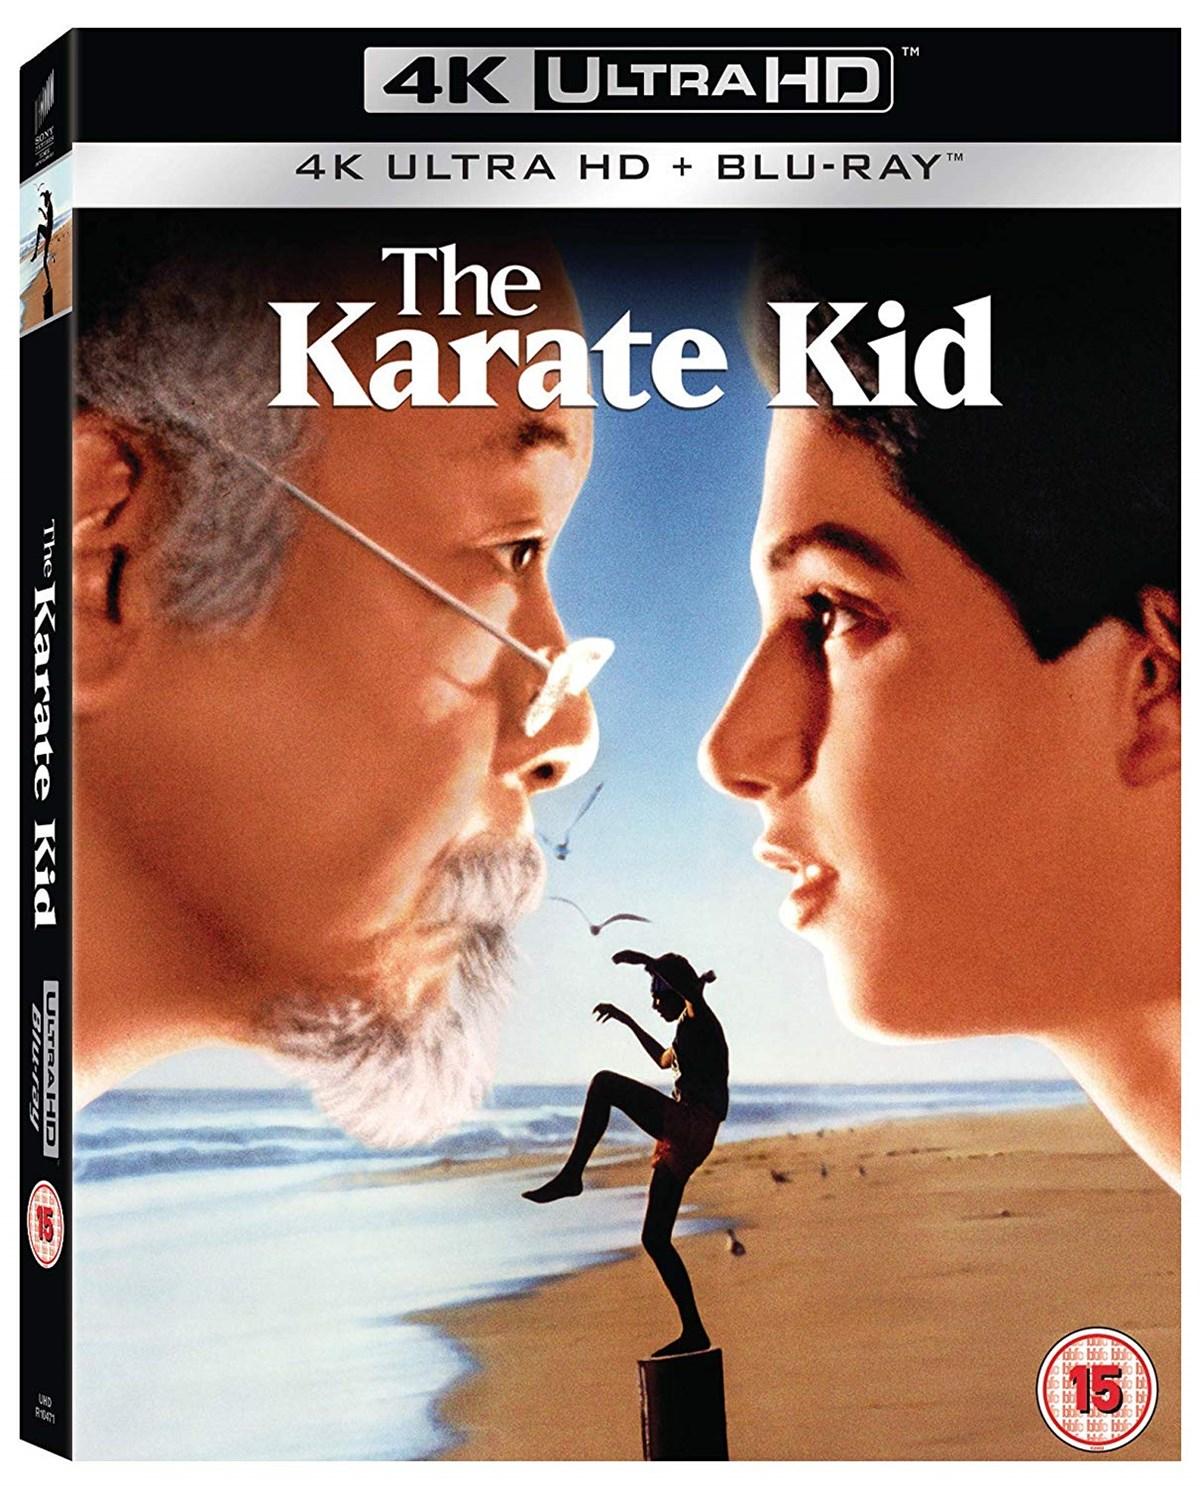 The Karate Kid (4K Ultra HD + Blu-ray (35th Anniversary)) [UHD] £9.99 @ Zoom